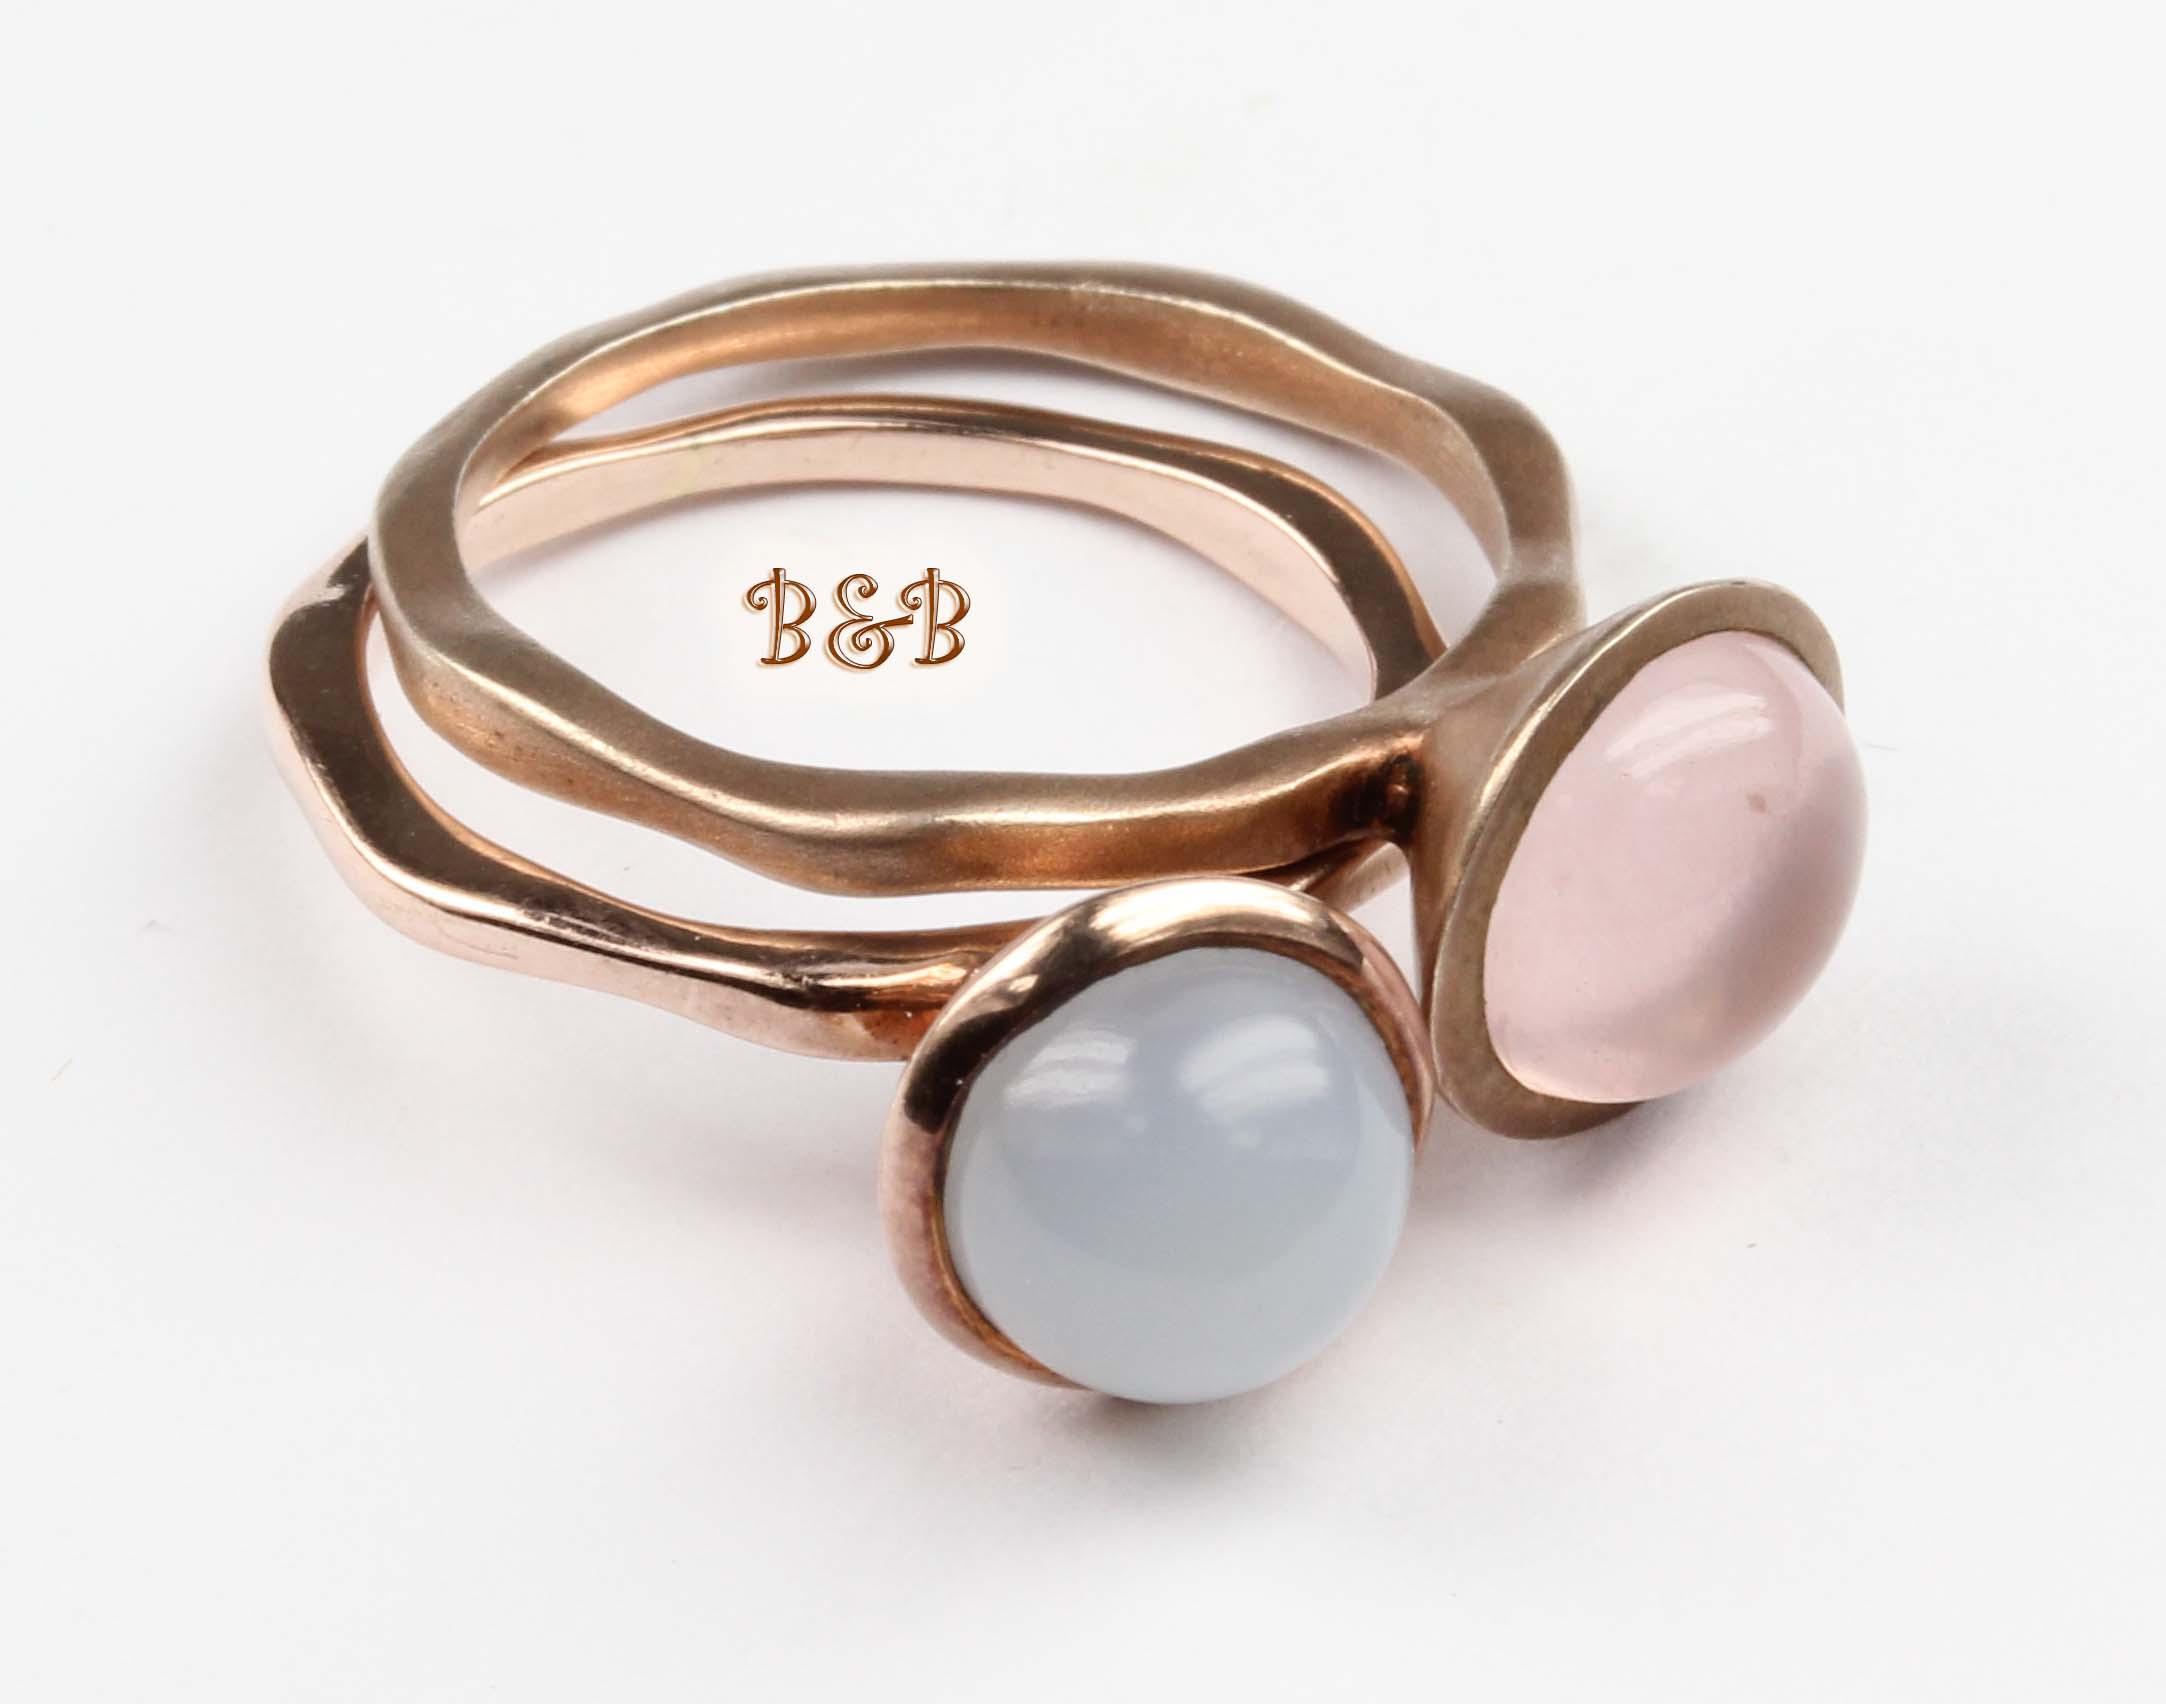 B&B Jewelry Brand